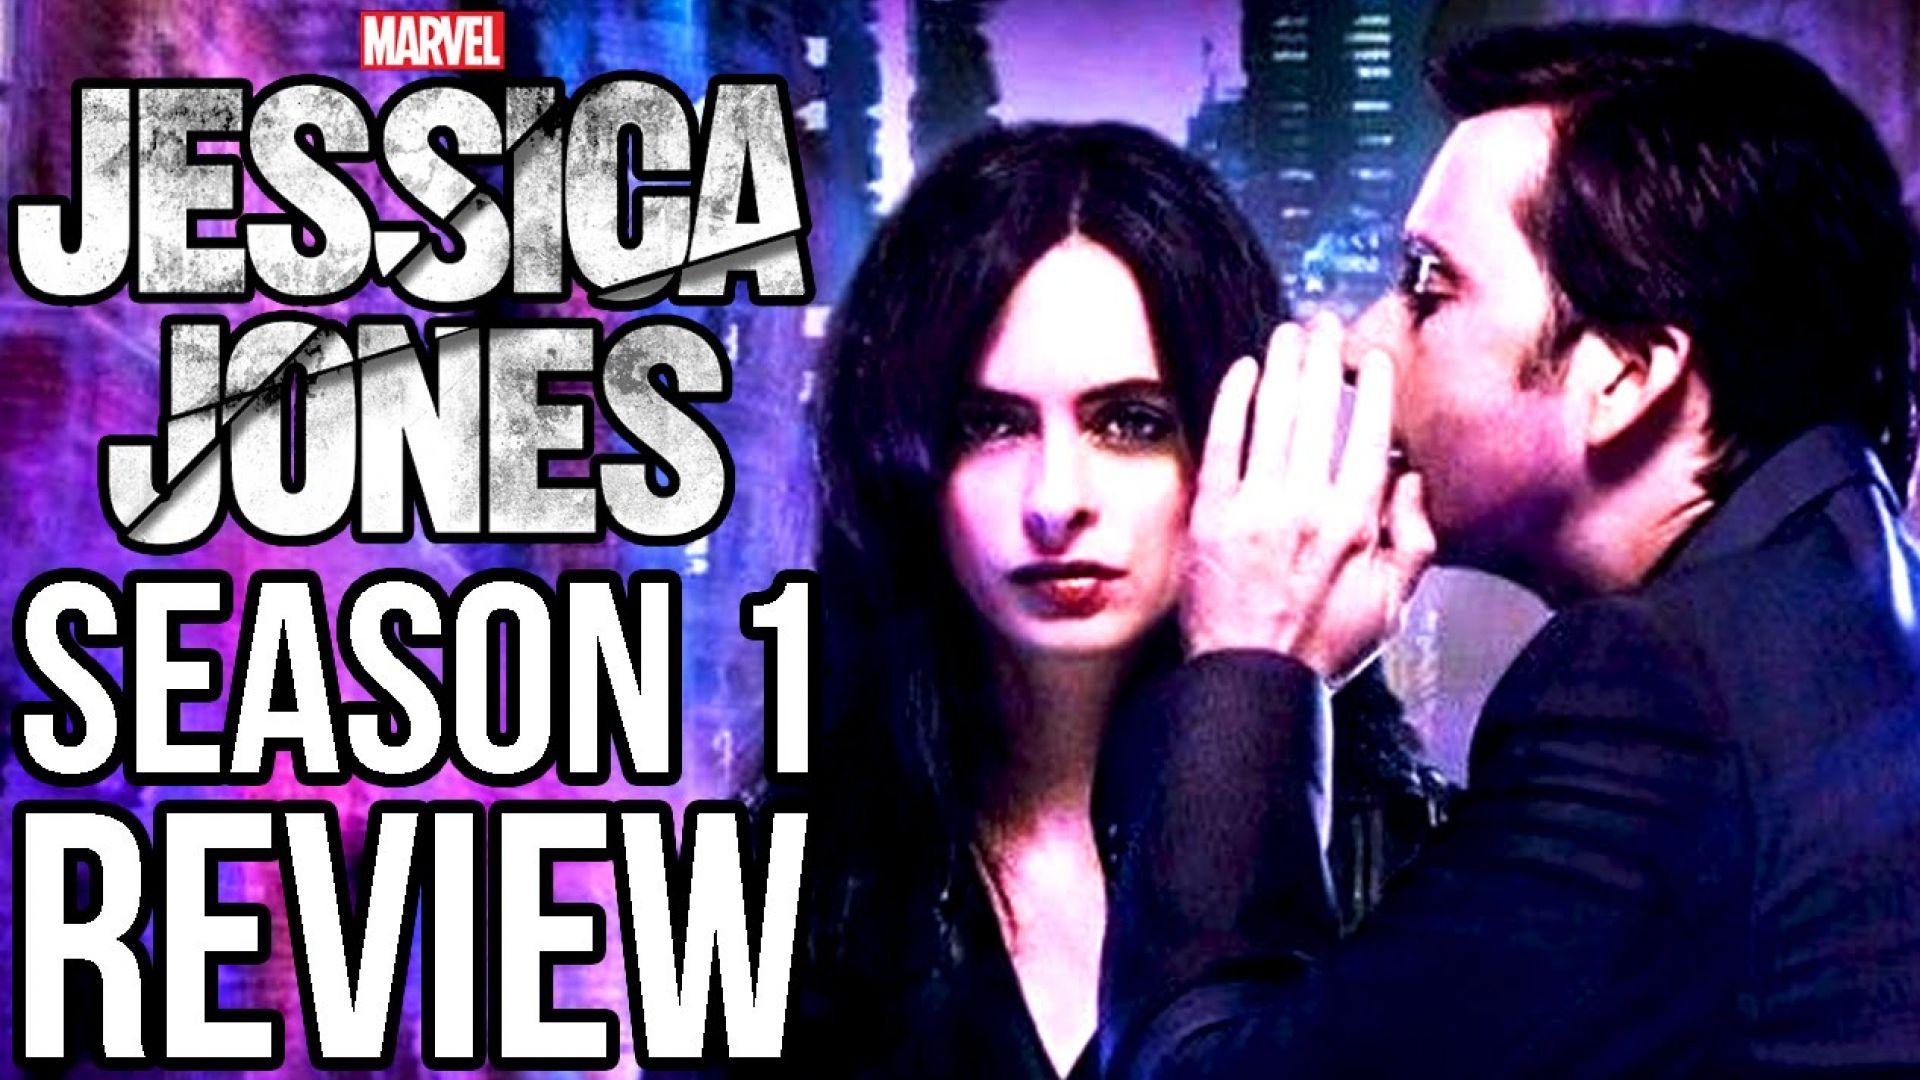 Jessica Jones Season 1 Review